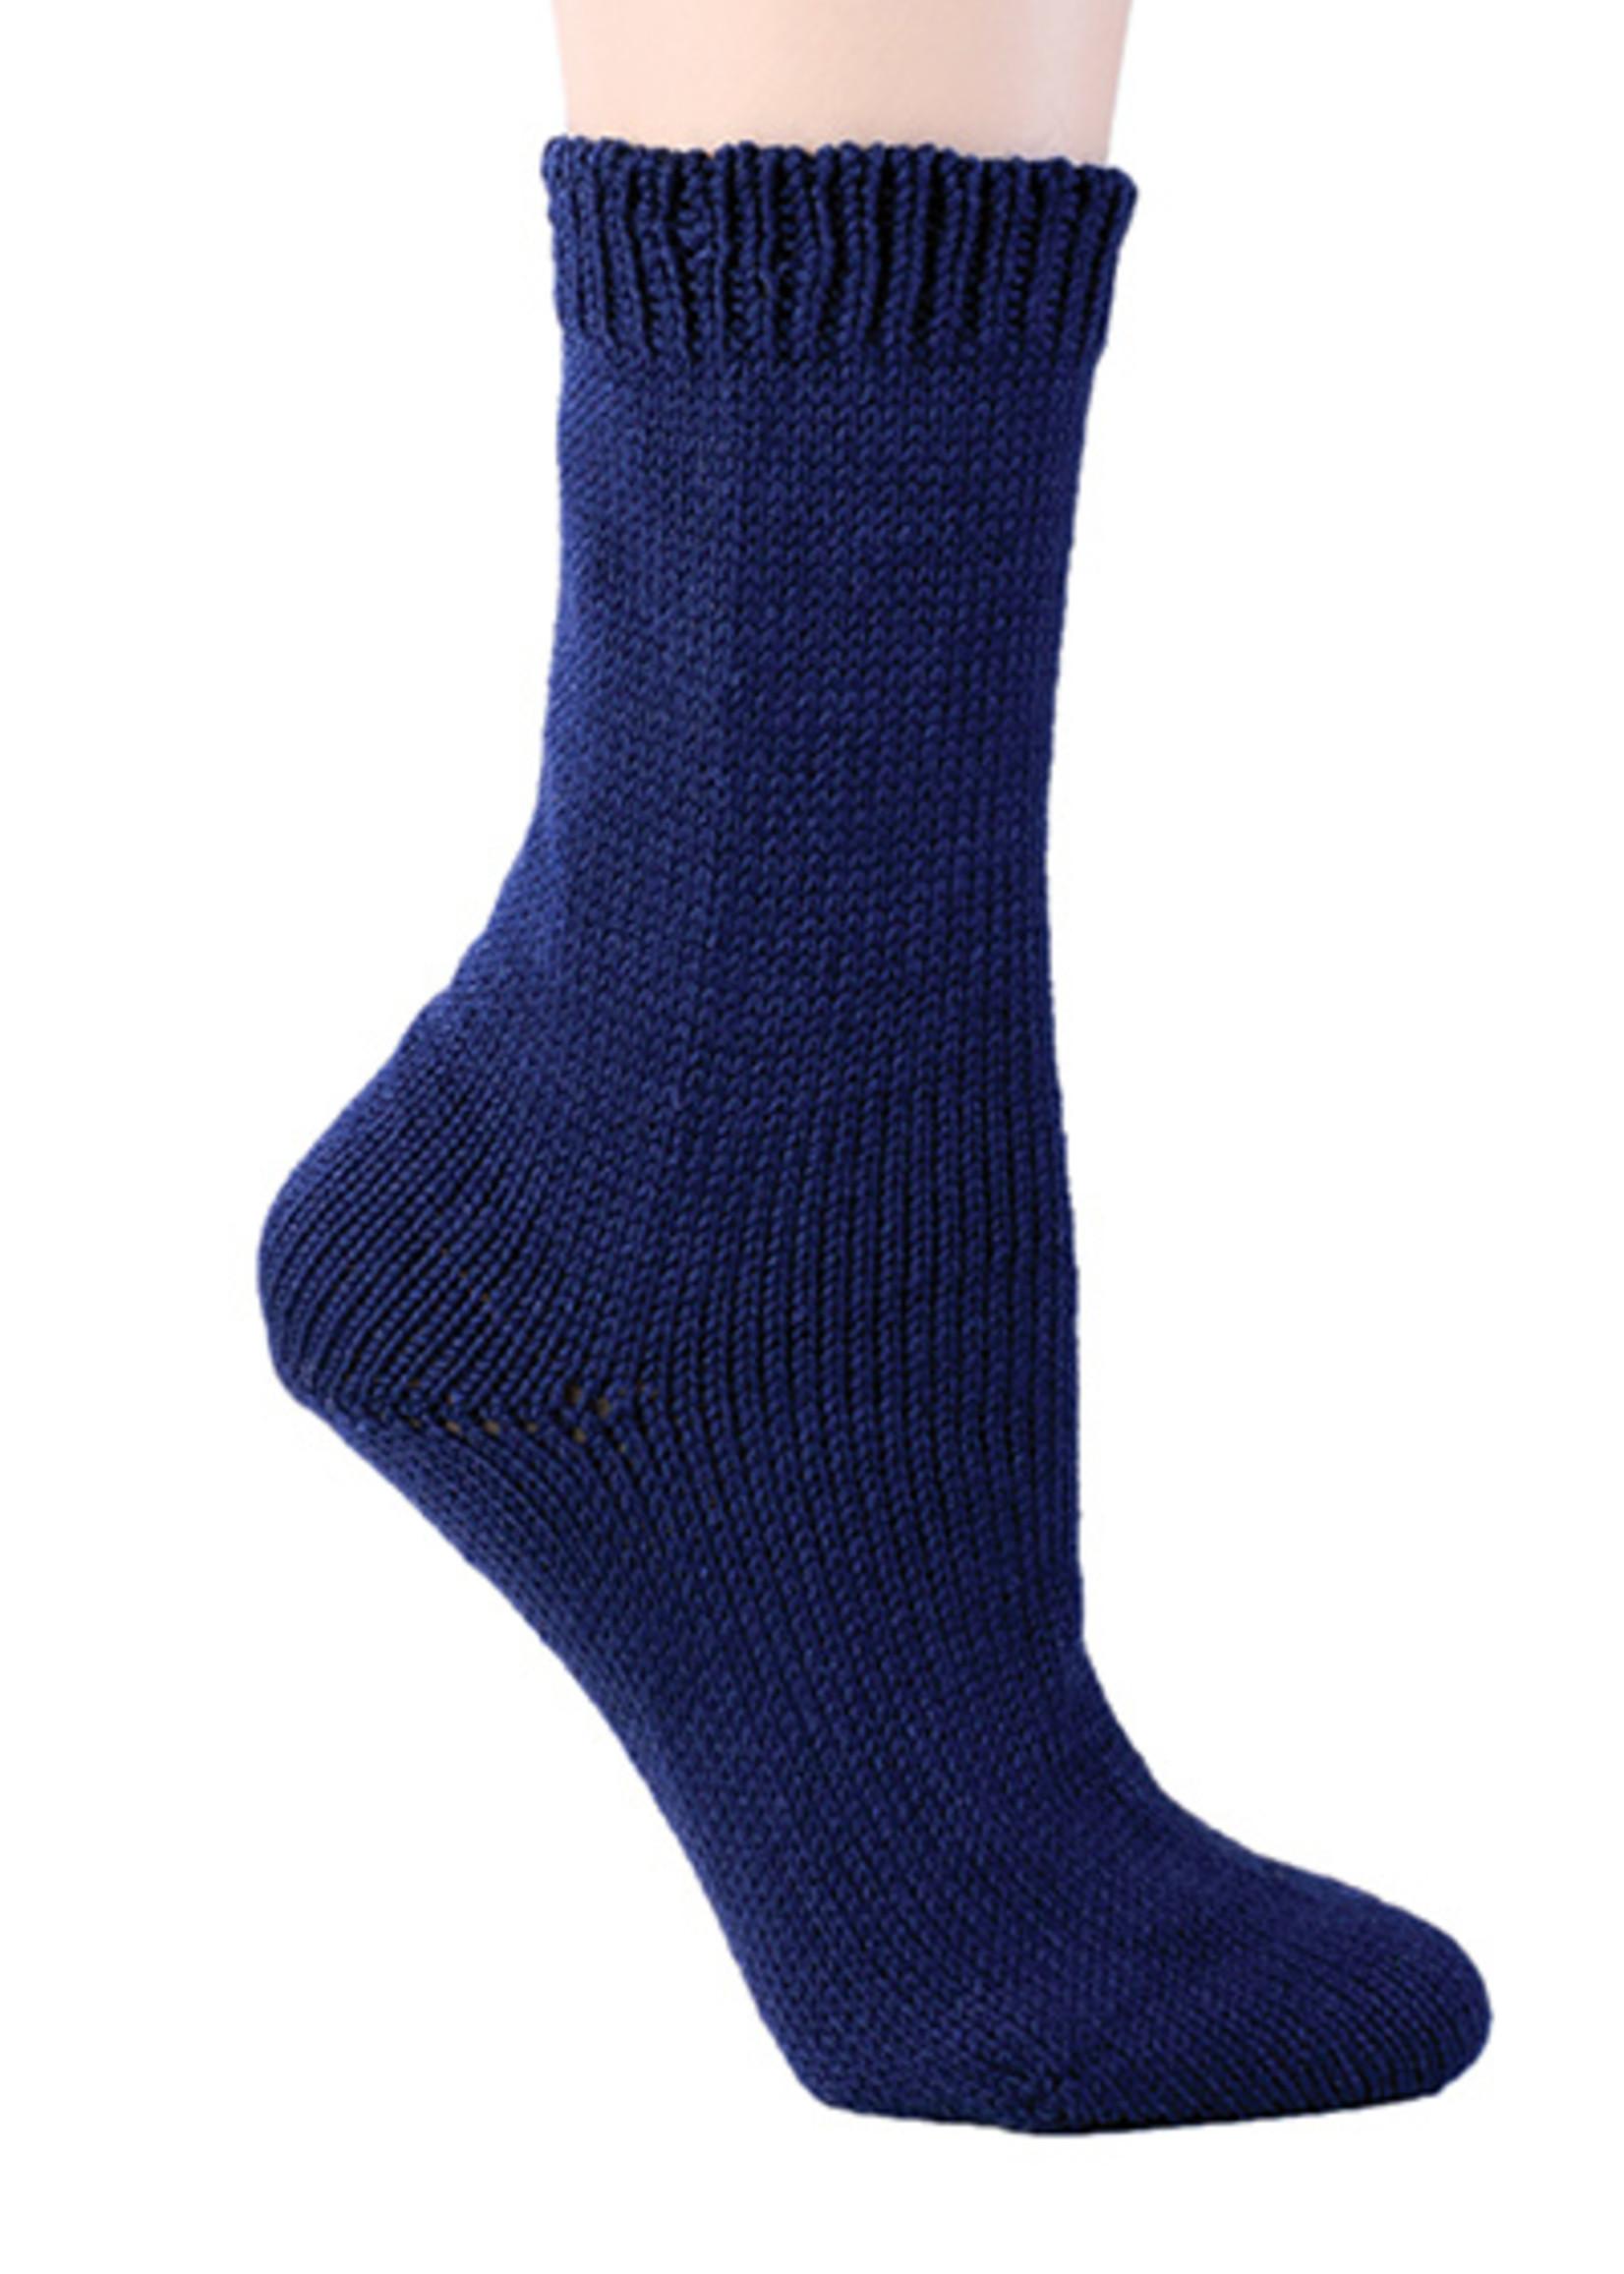 Berroco Berroco Comfort Sock Yarn #1763 Navy Blue